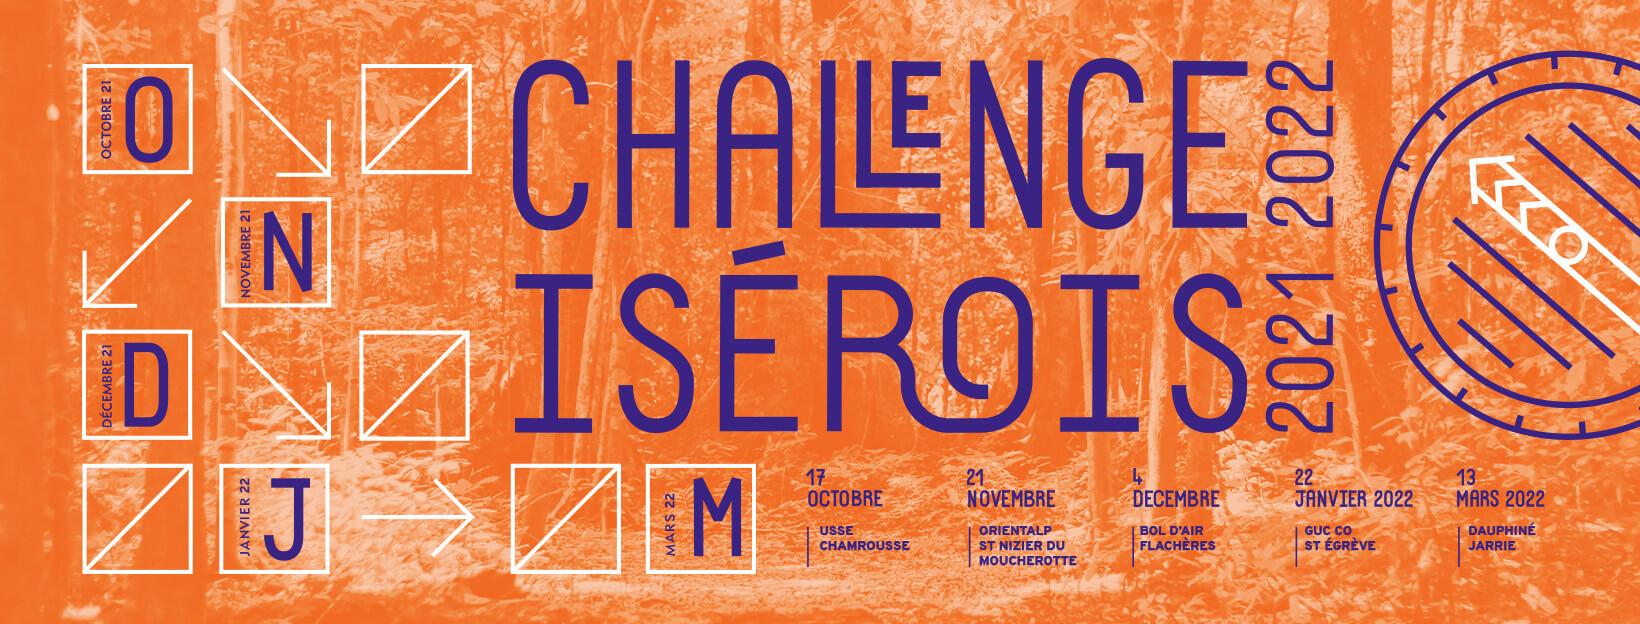 Challenge Iserois 2021-2022